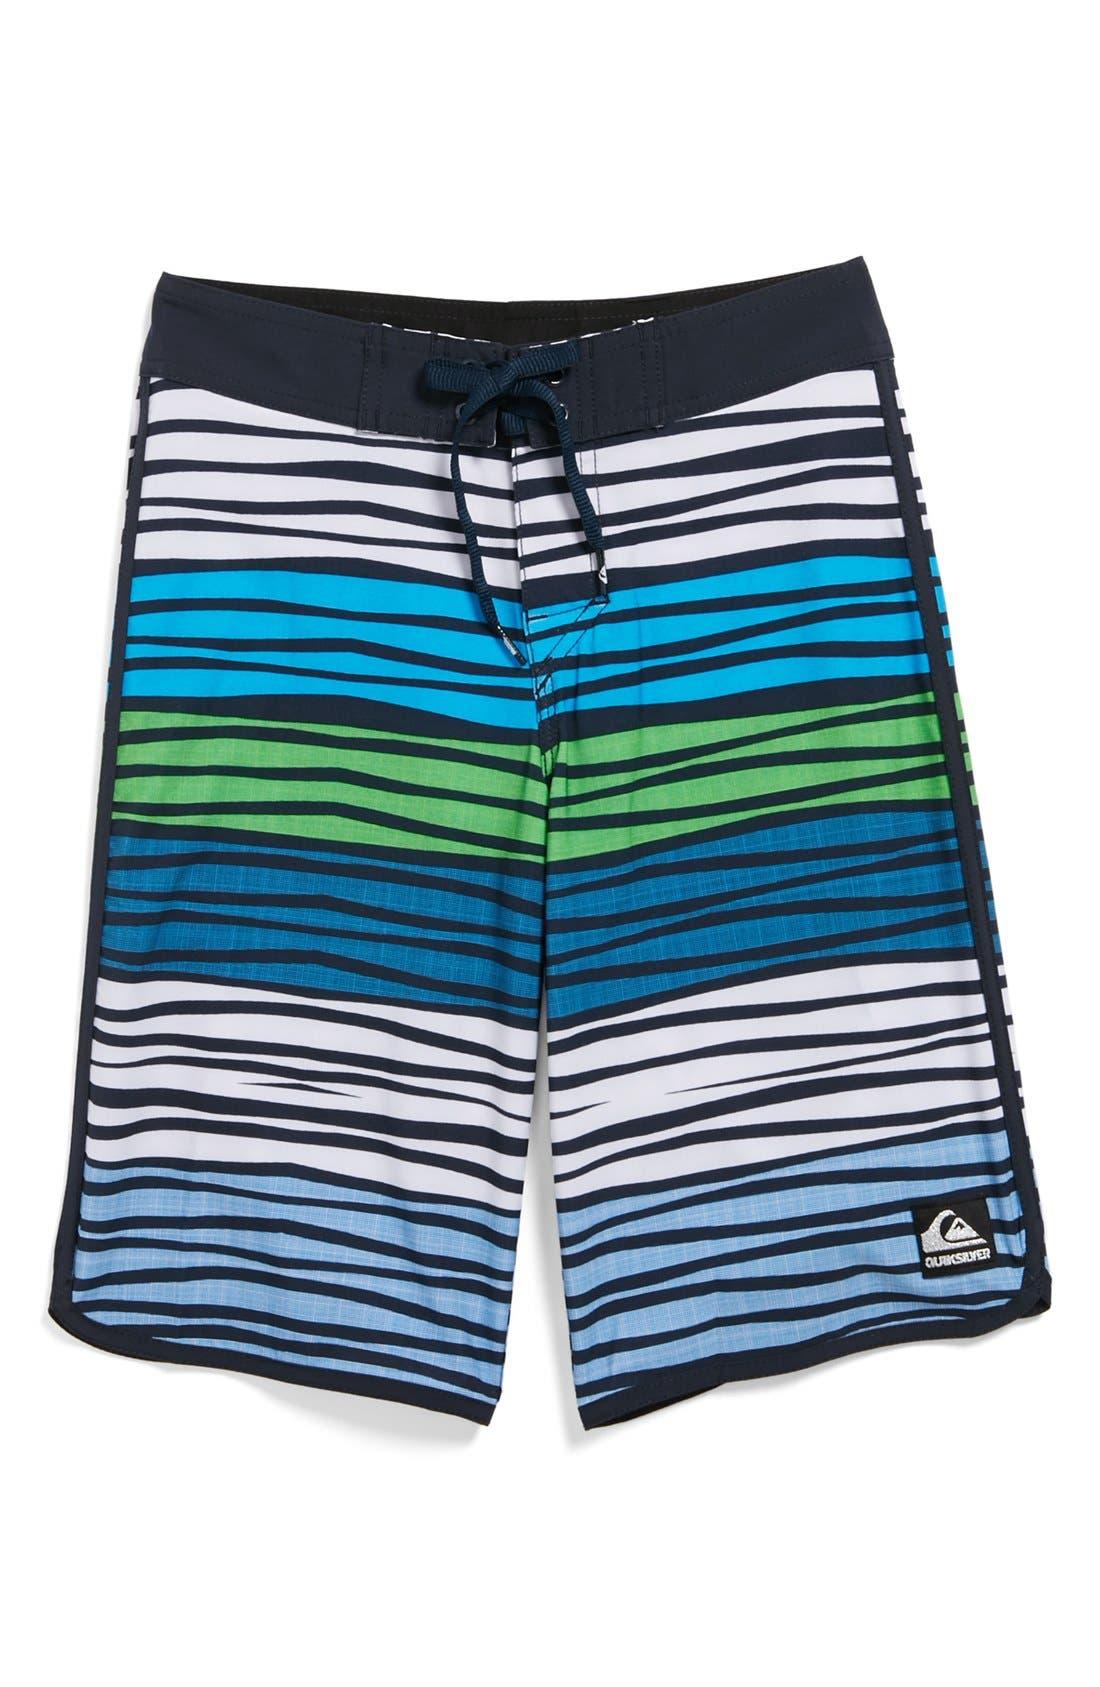 Main Image - Quiksilver 'Ratio' Board Shorts (Big Boys)